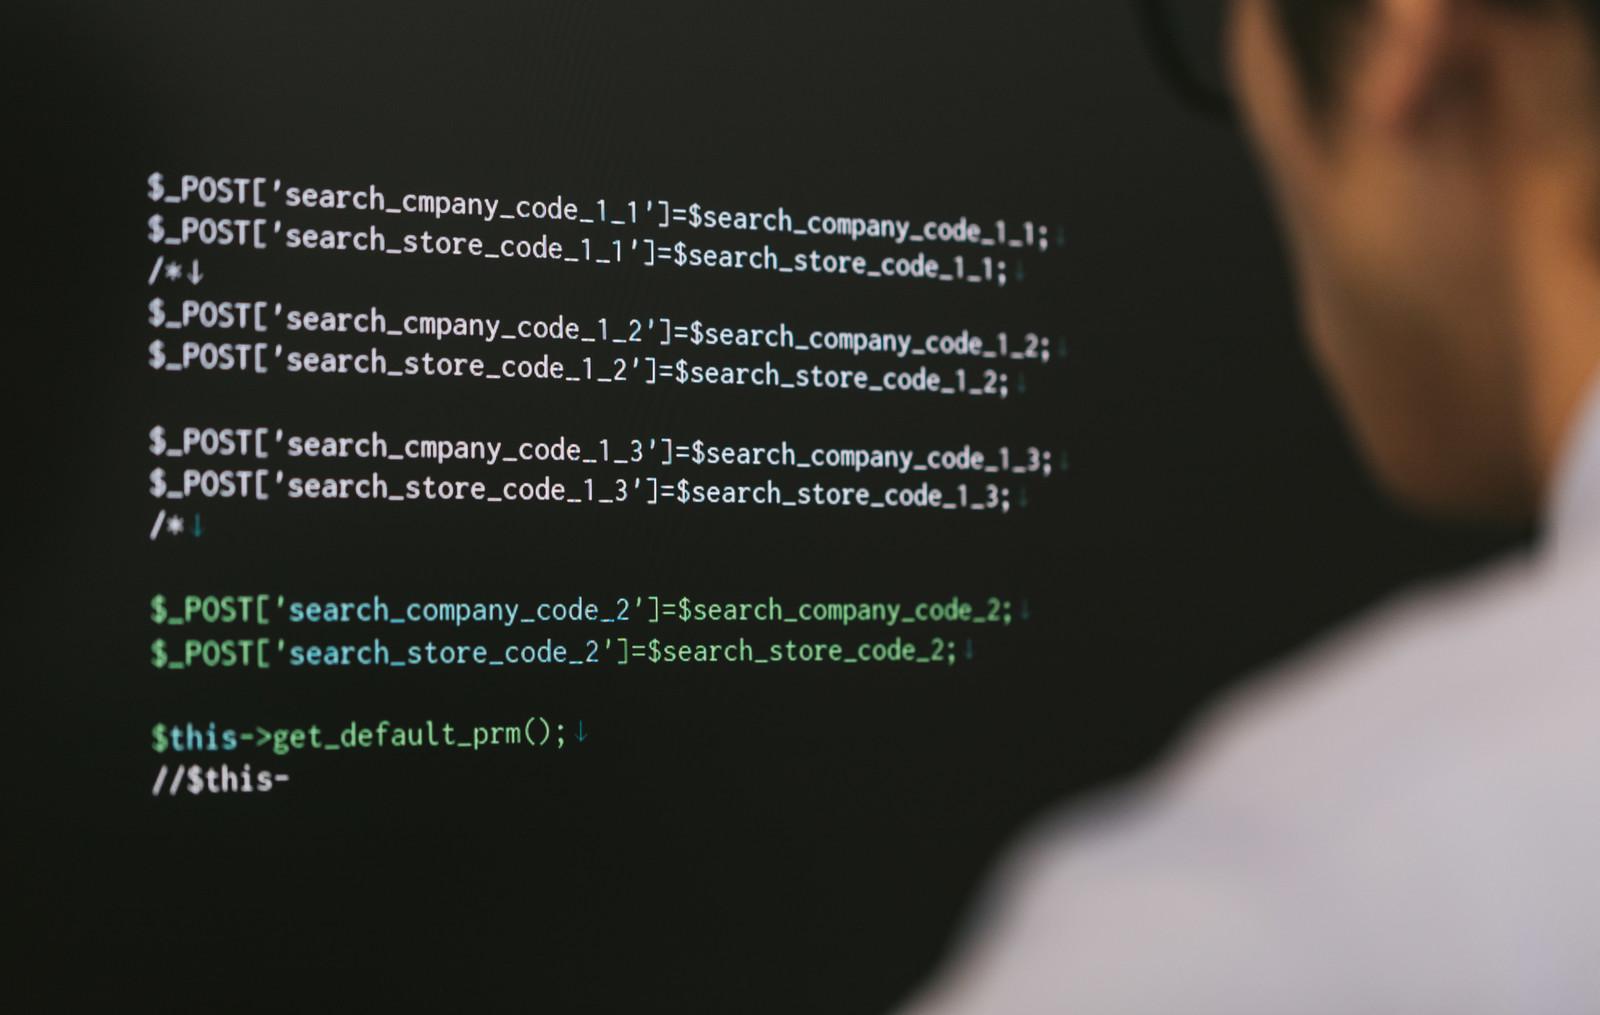 IT未経験者は会社の研修制度よりスクールを利用すべき7つの理由